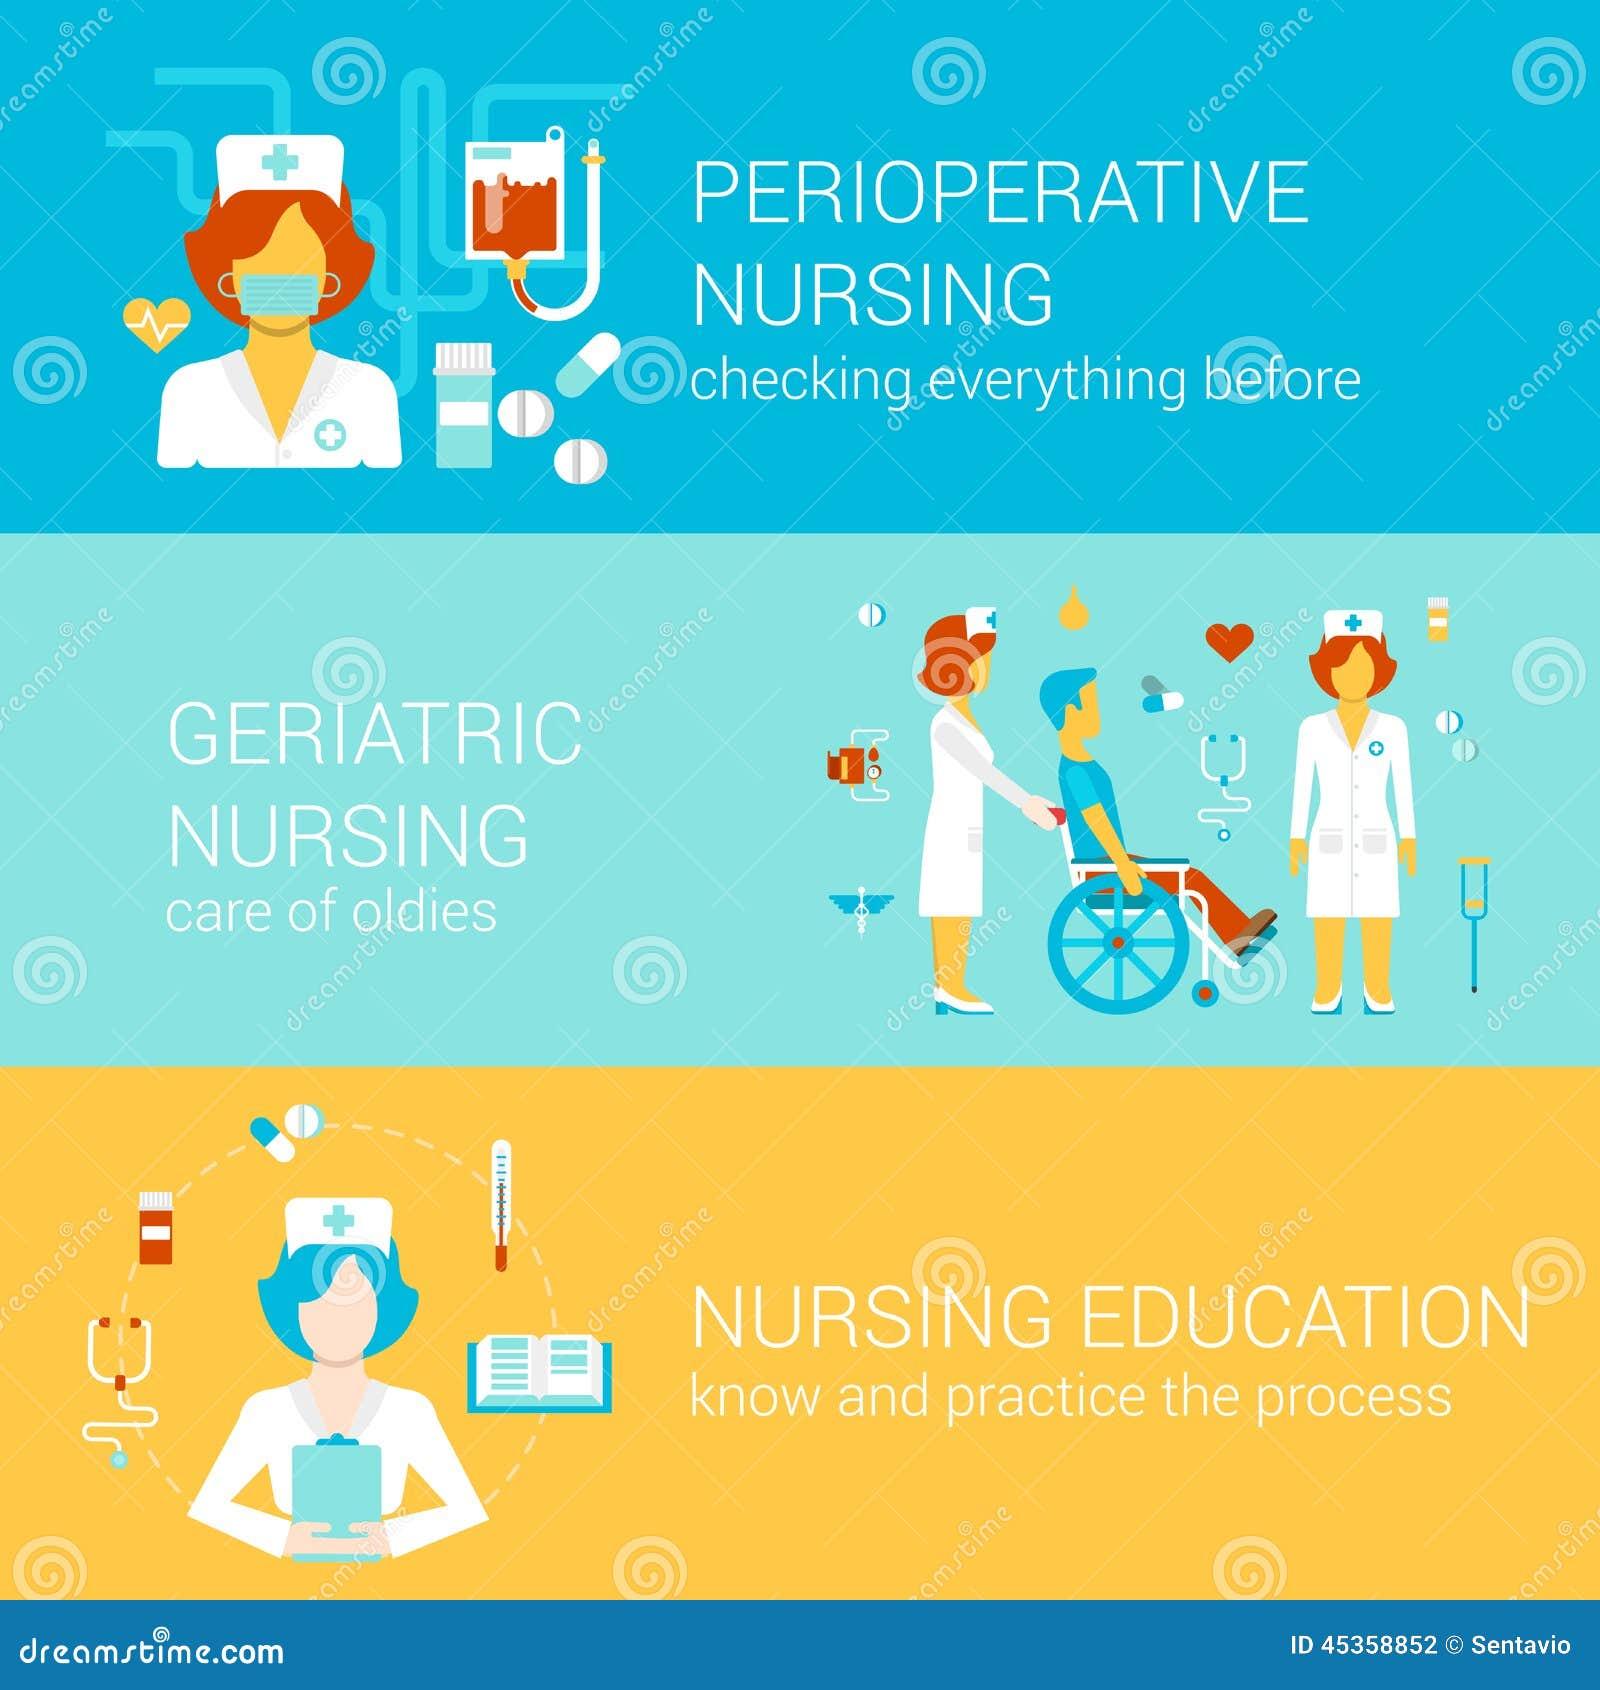 Geriatric Nursing Care in the Acute Hospital Setting